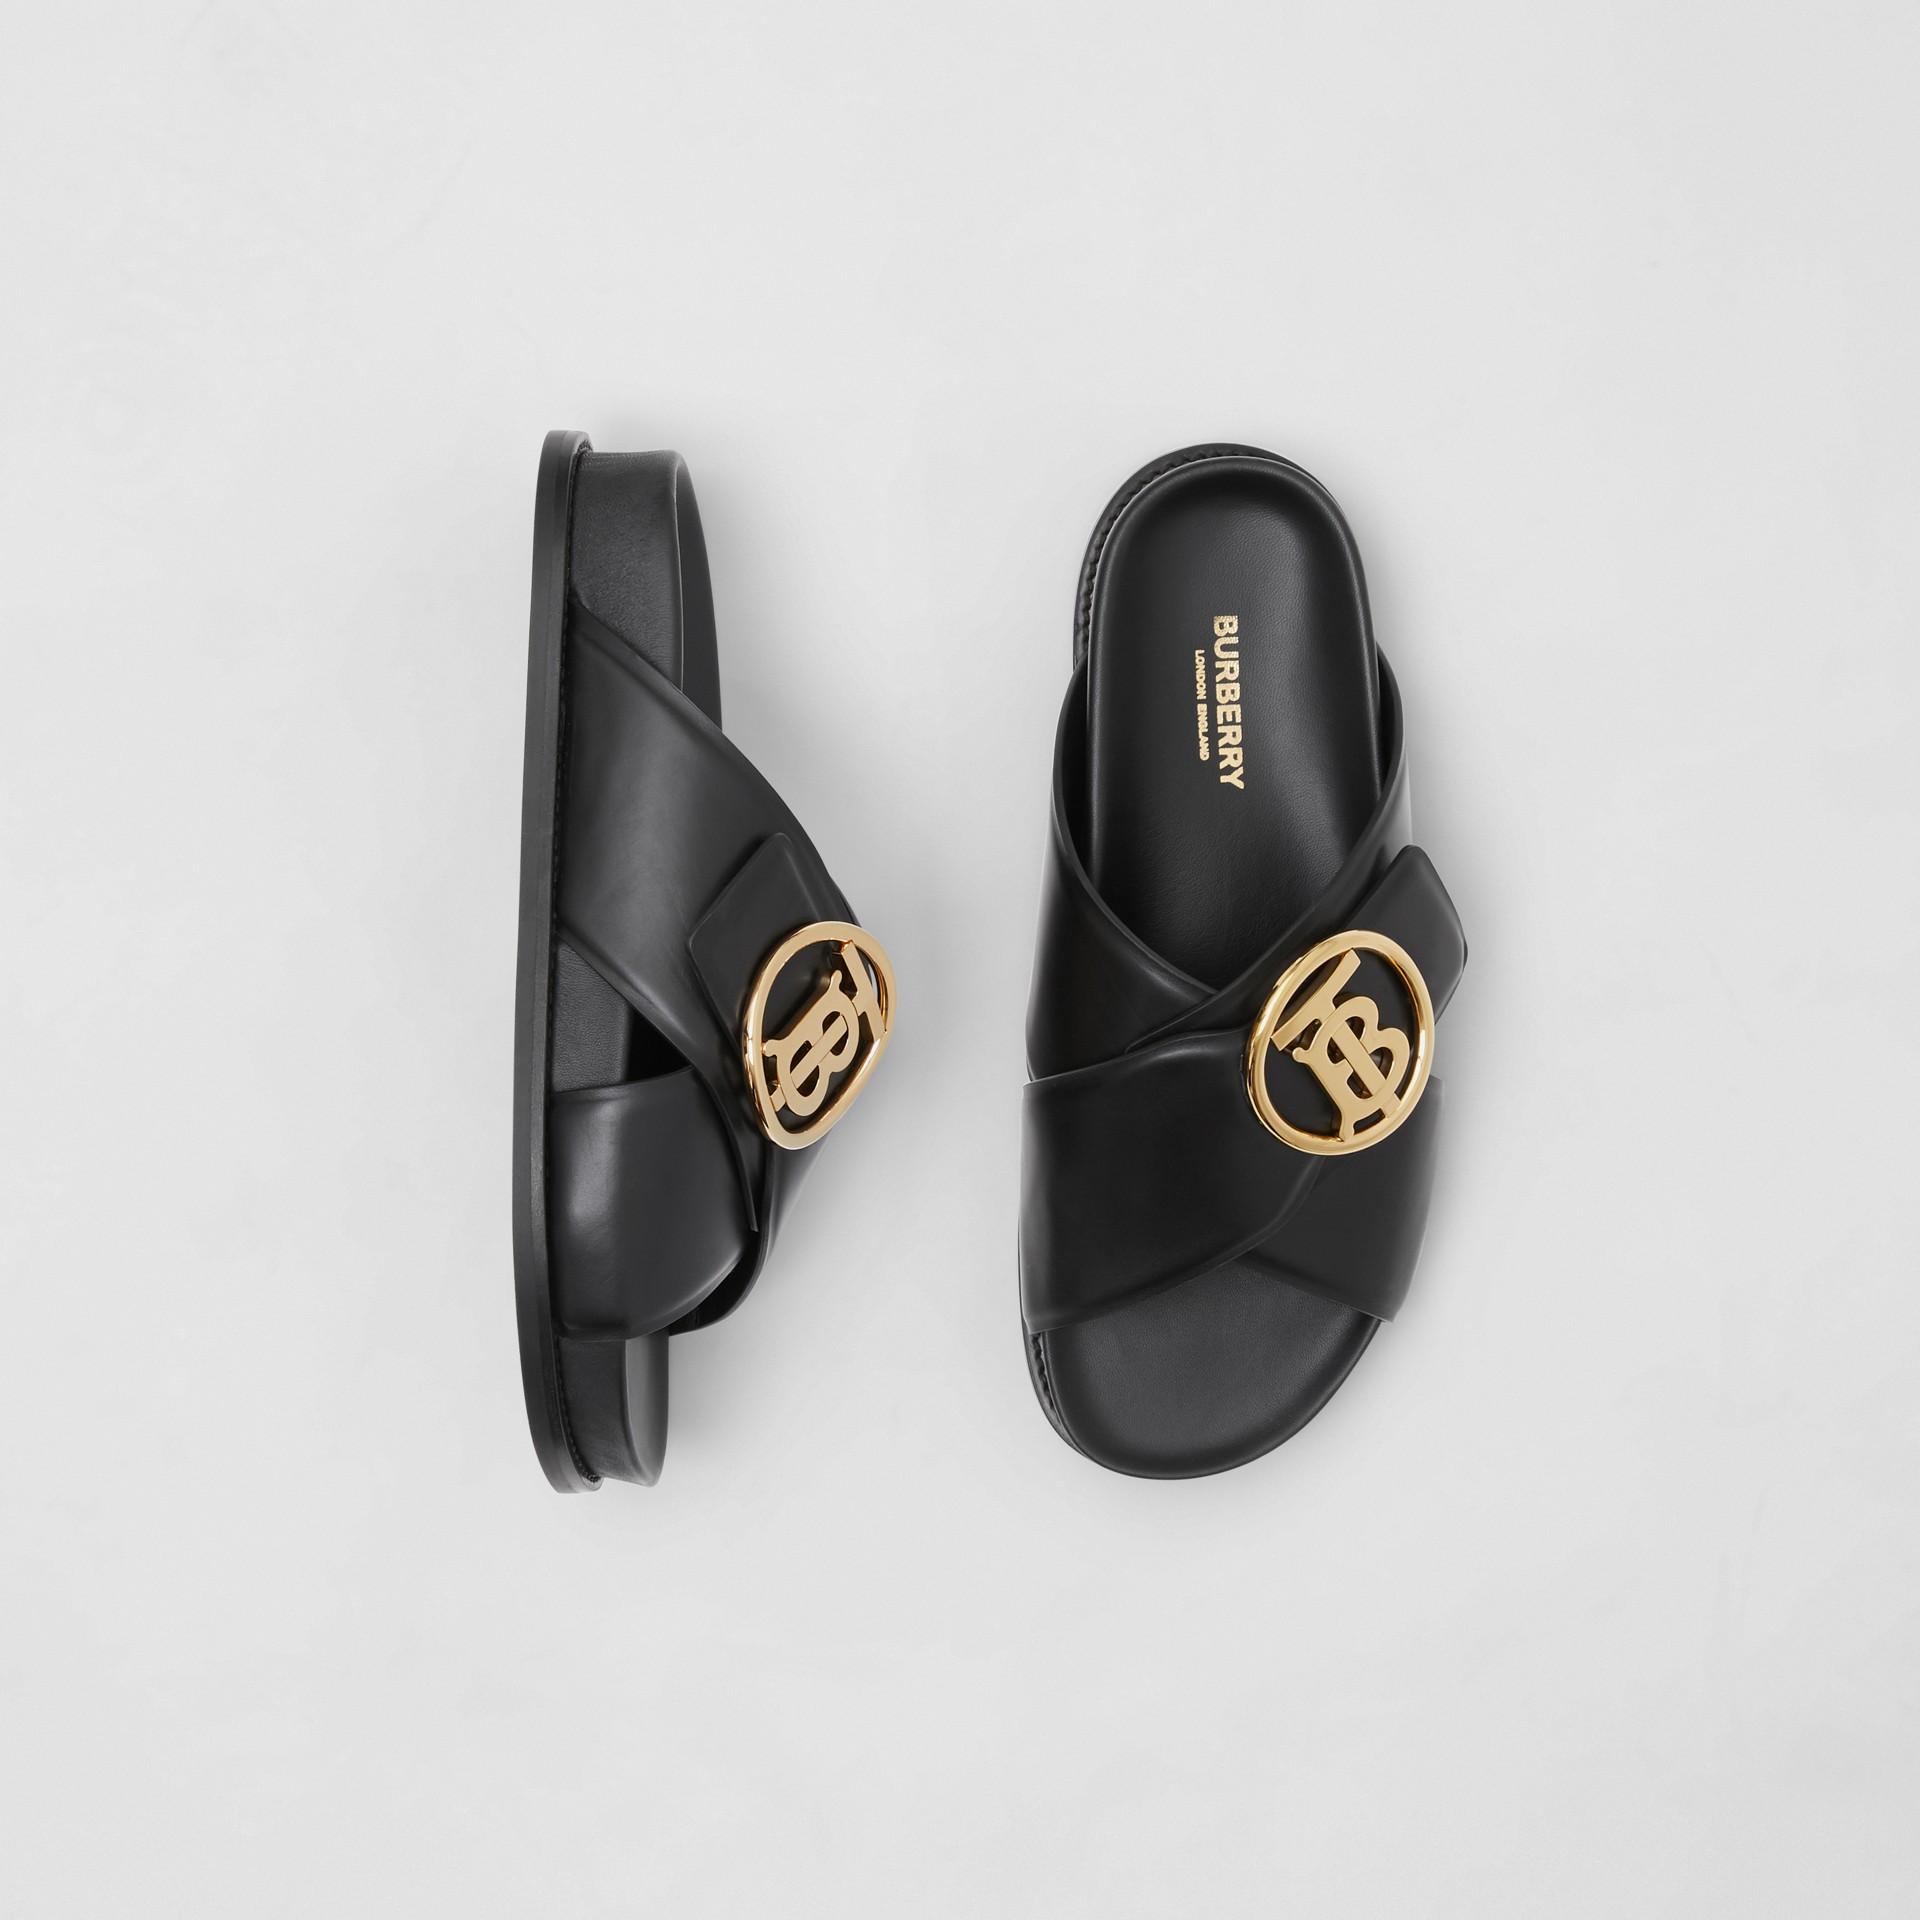 Monogram Motif Leather Slides in Black - Women | Burberry - gallery image 0